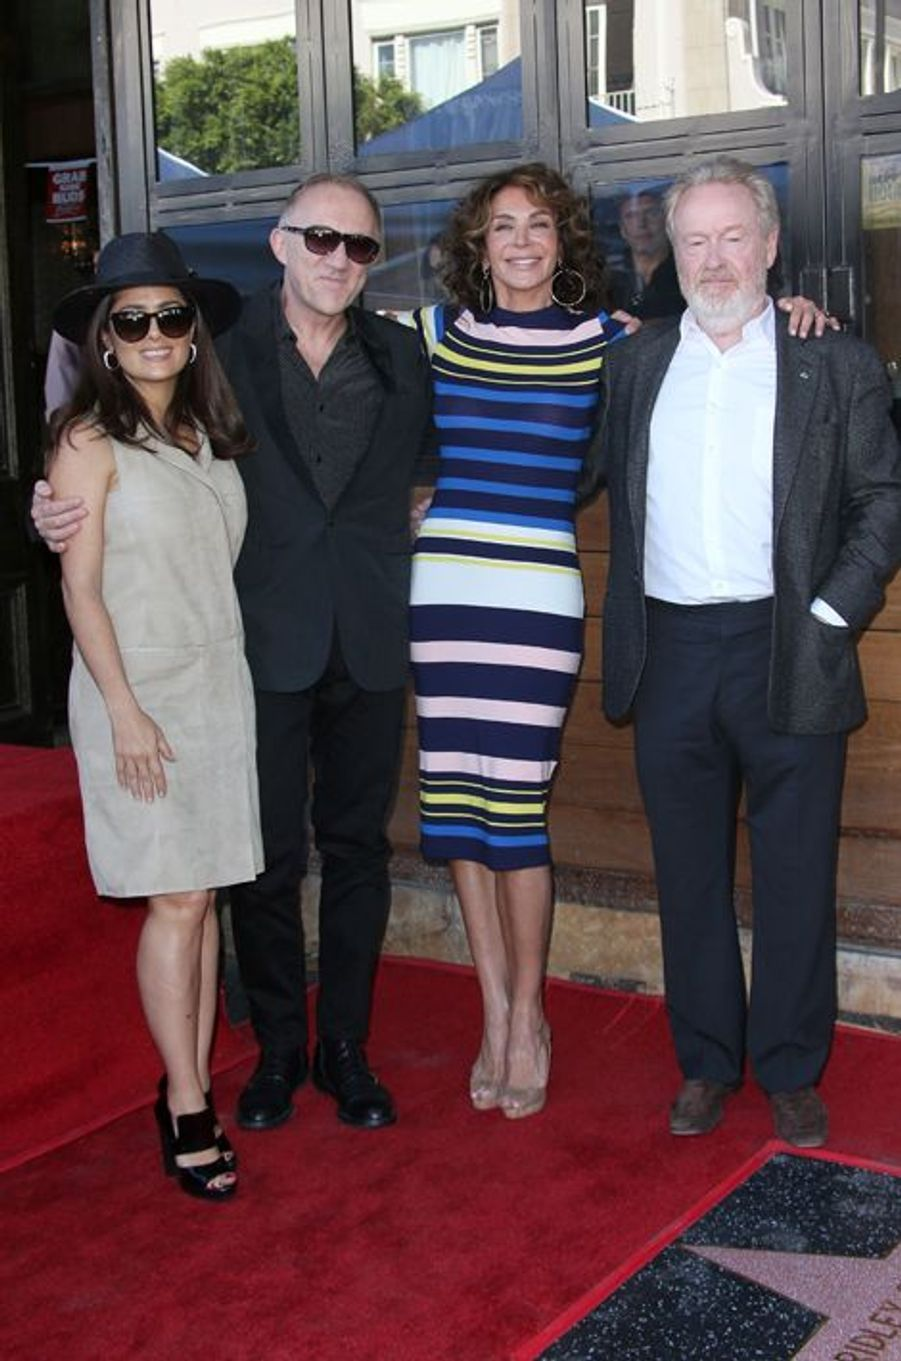 Salma Hayek, François-Henri Pinault, Giannina Facio et Ridley Scott